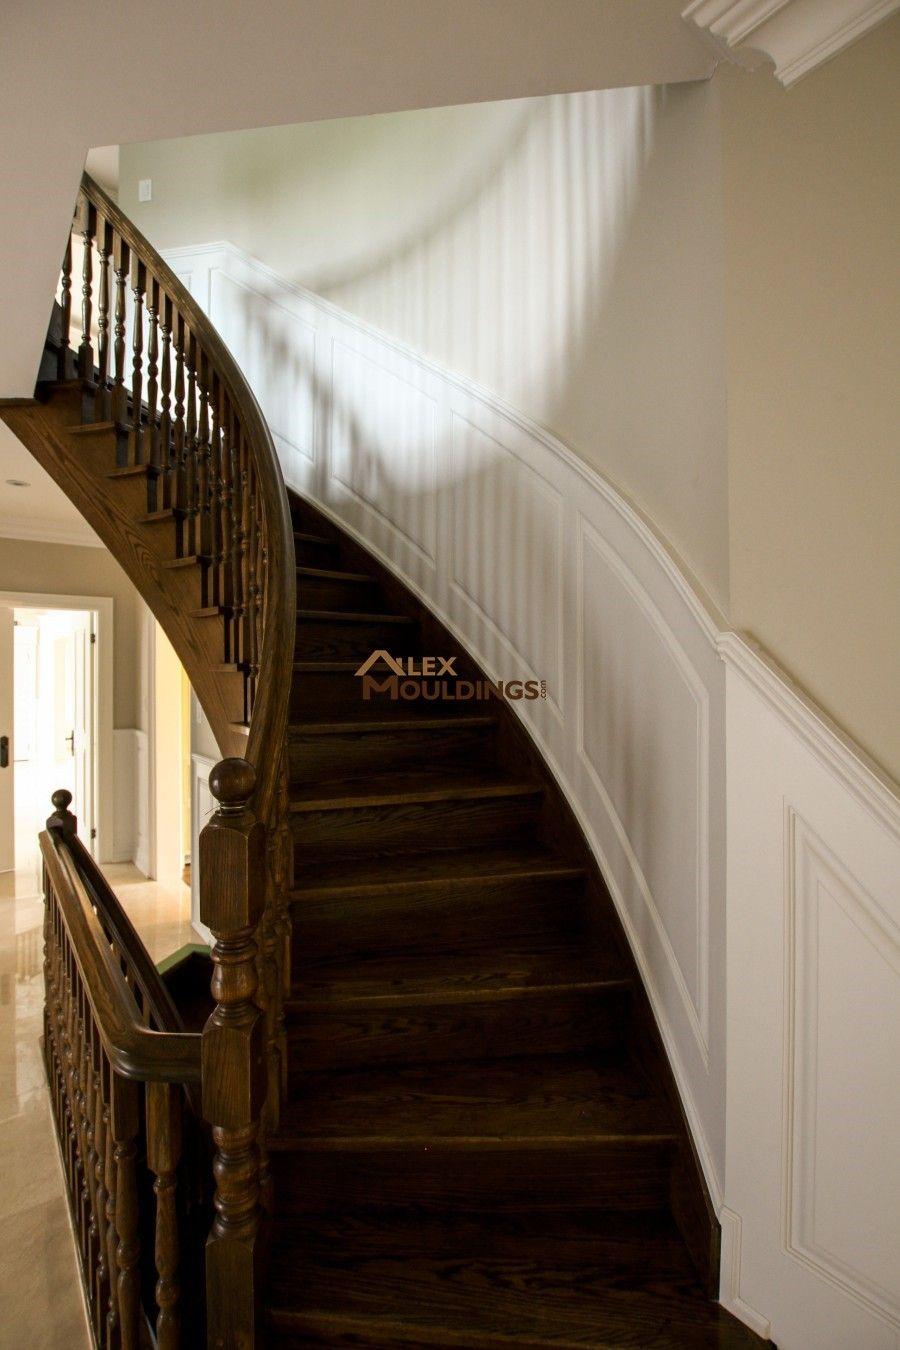 Curvy Stairway Raised Panel Type Stair Paneling Wainscoting Wainscoting Wall